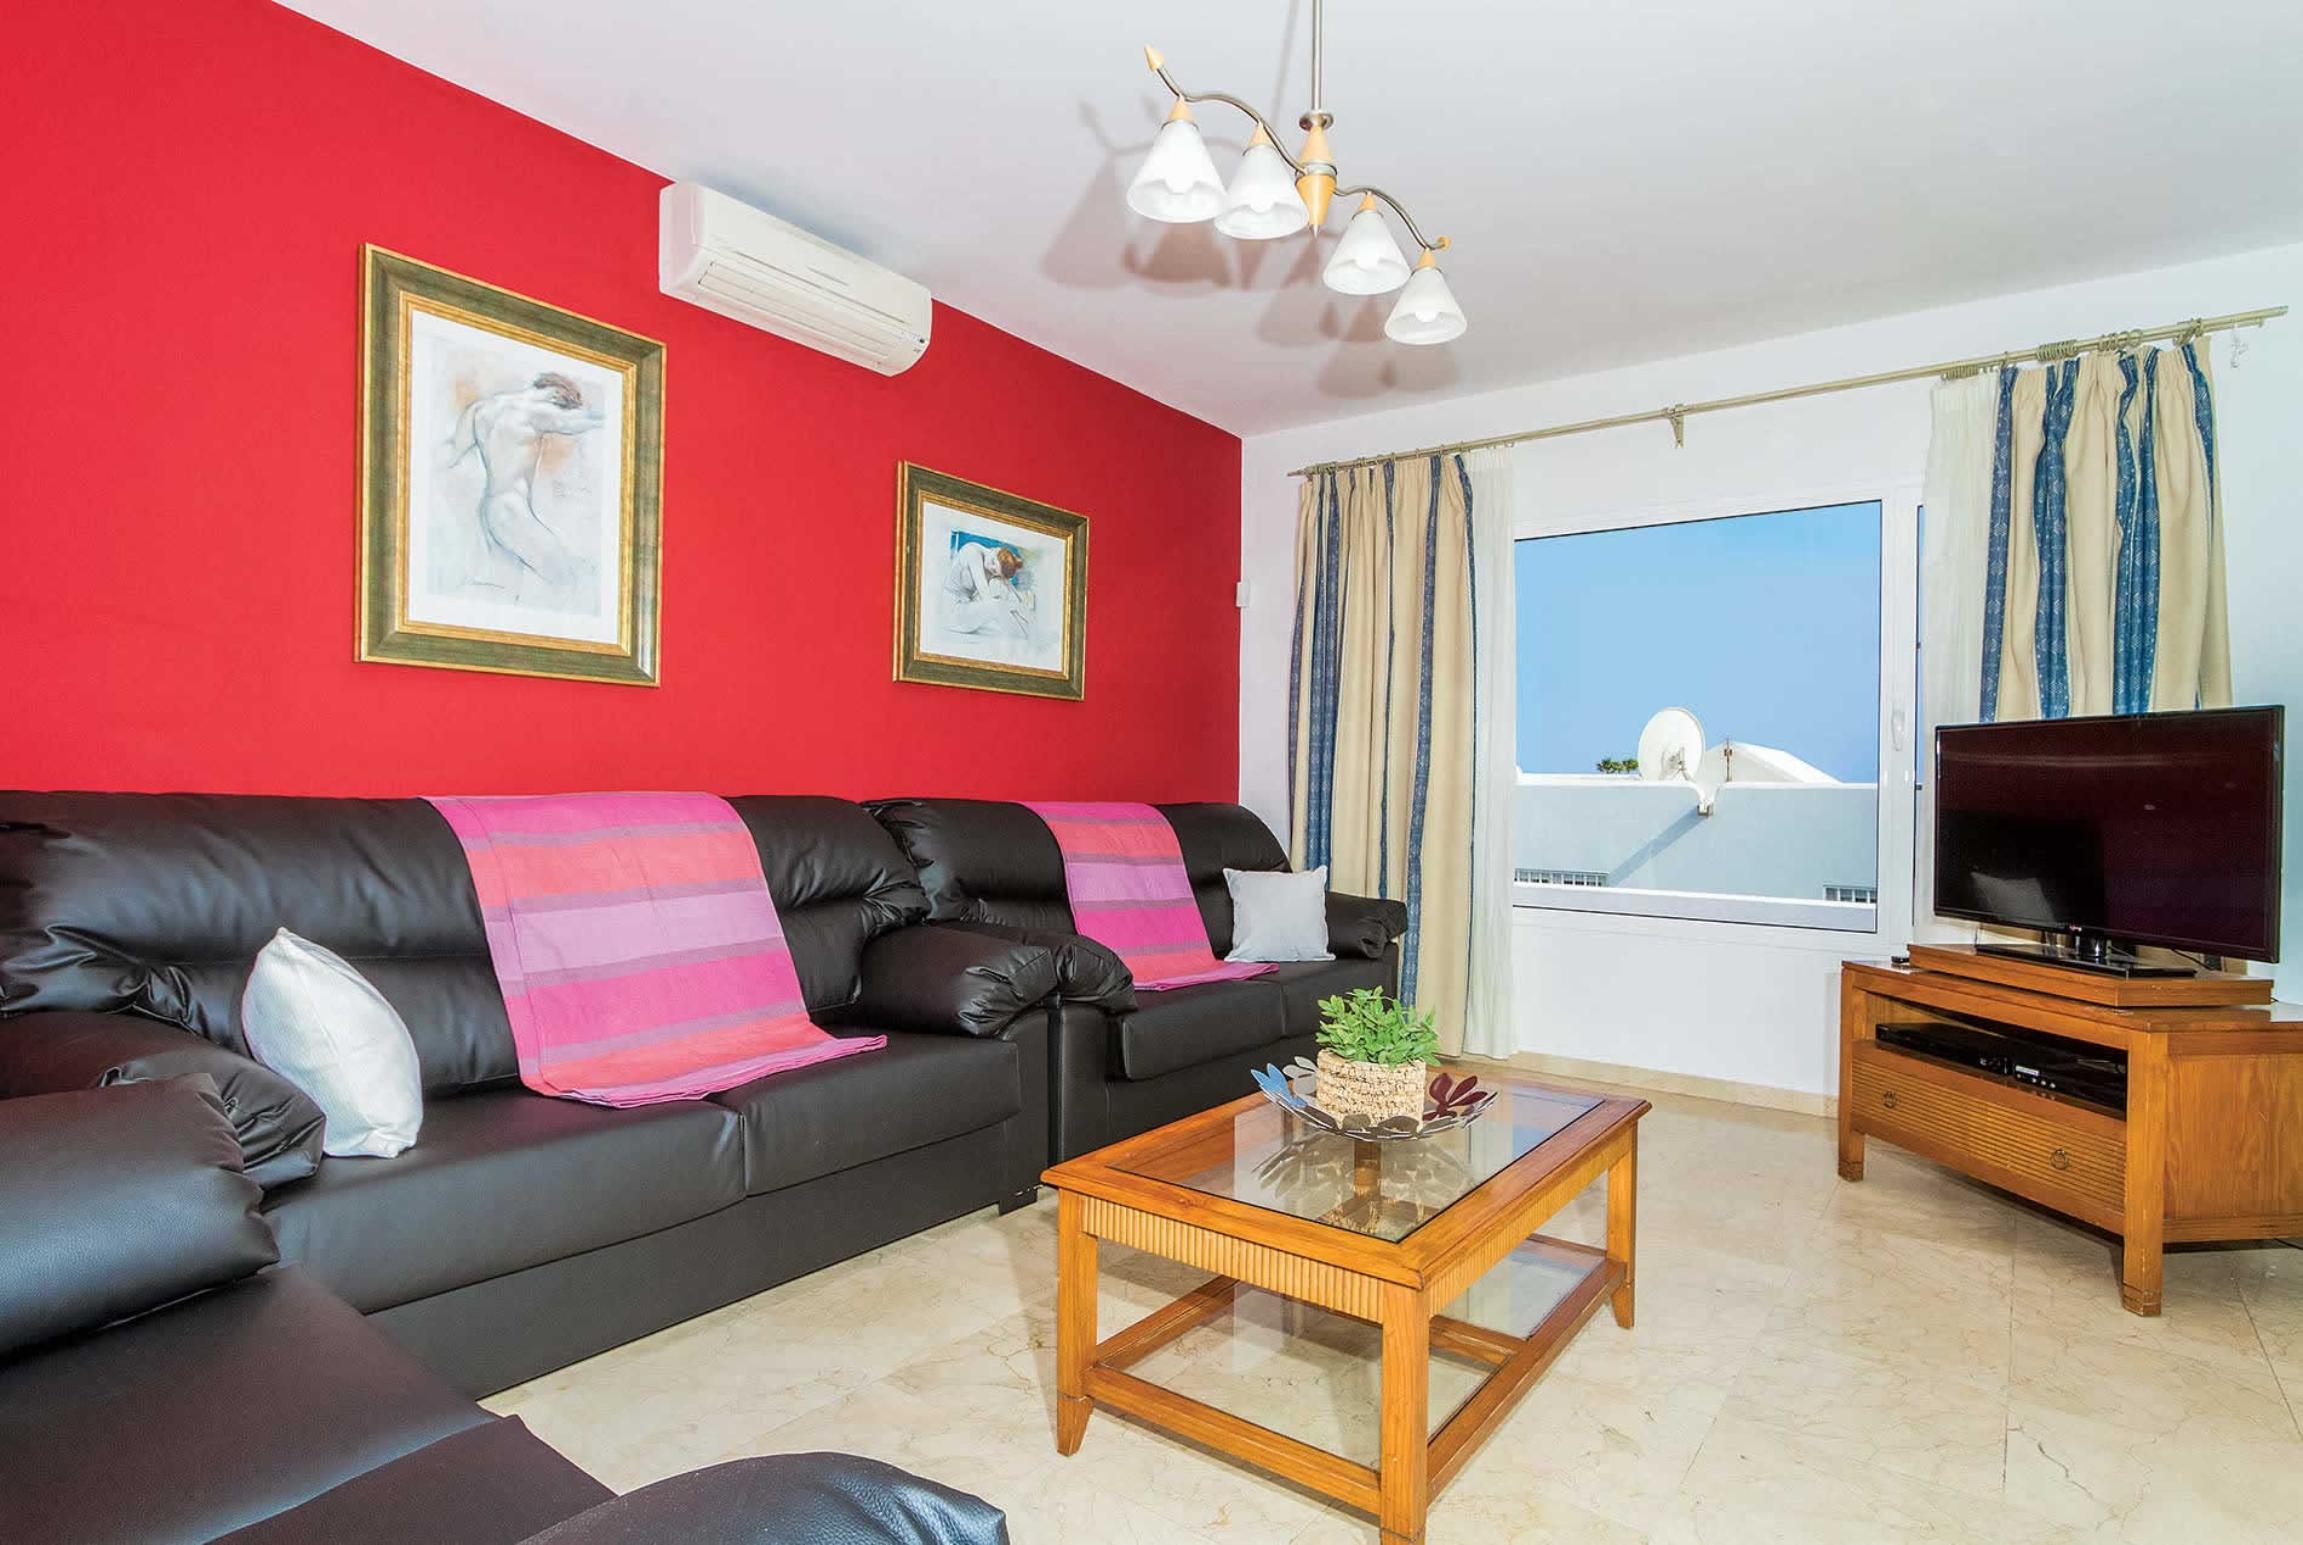 Ferienhaus Casa Candela (2654390), Puerto del Carmen, Lanzarote, Kanarische Inseln, Spanien, Bild 2